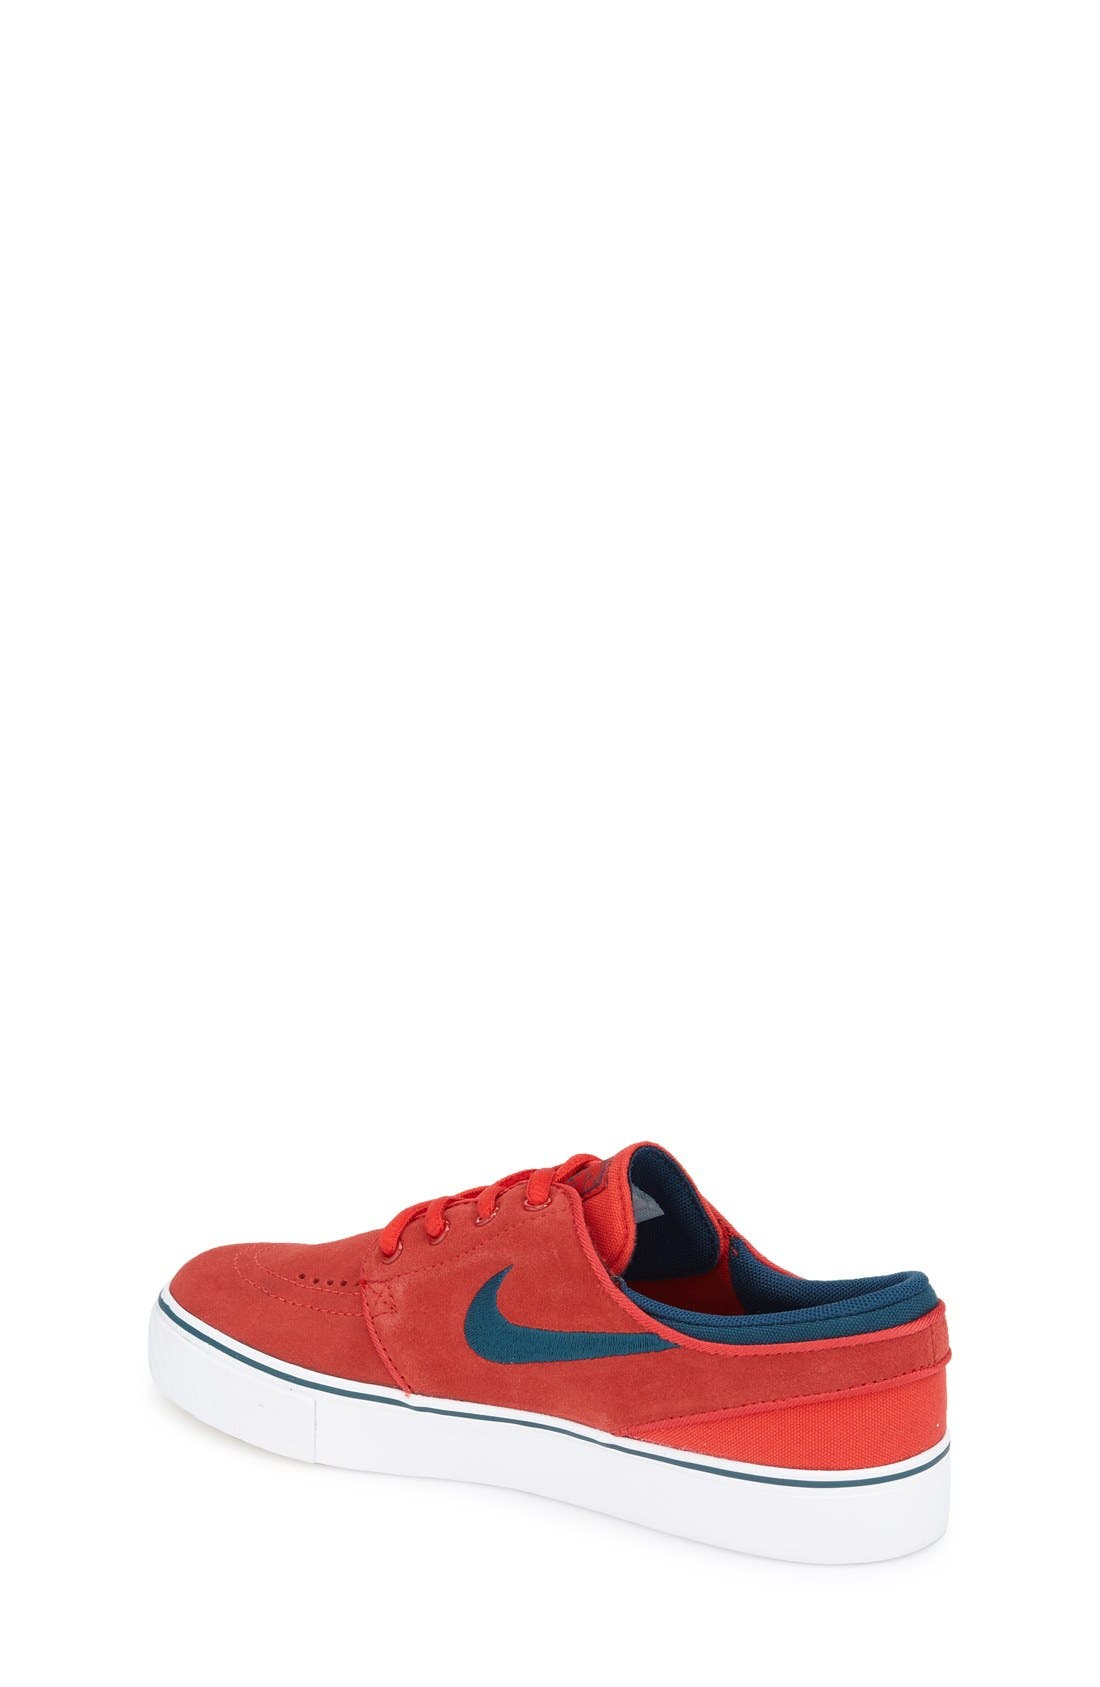 'Stefan Janoski' Sneaker,                             Alternate thumbnail 42, color,